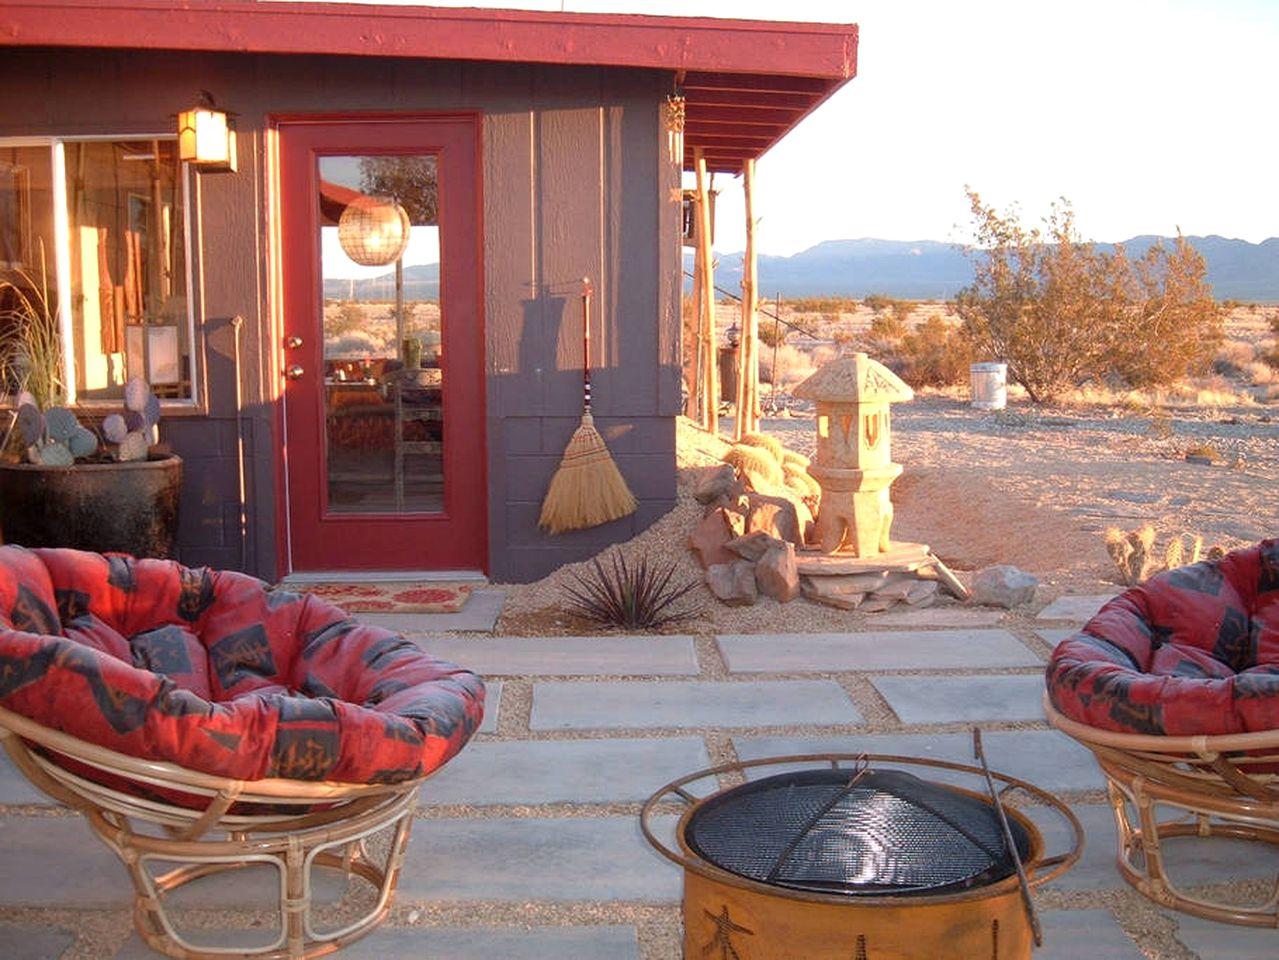 Cabin Rental On Joshua Tree National Park California